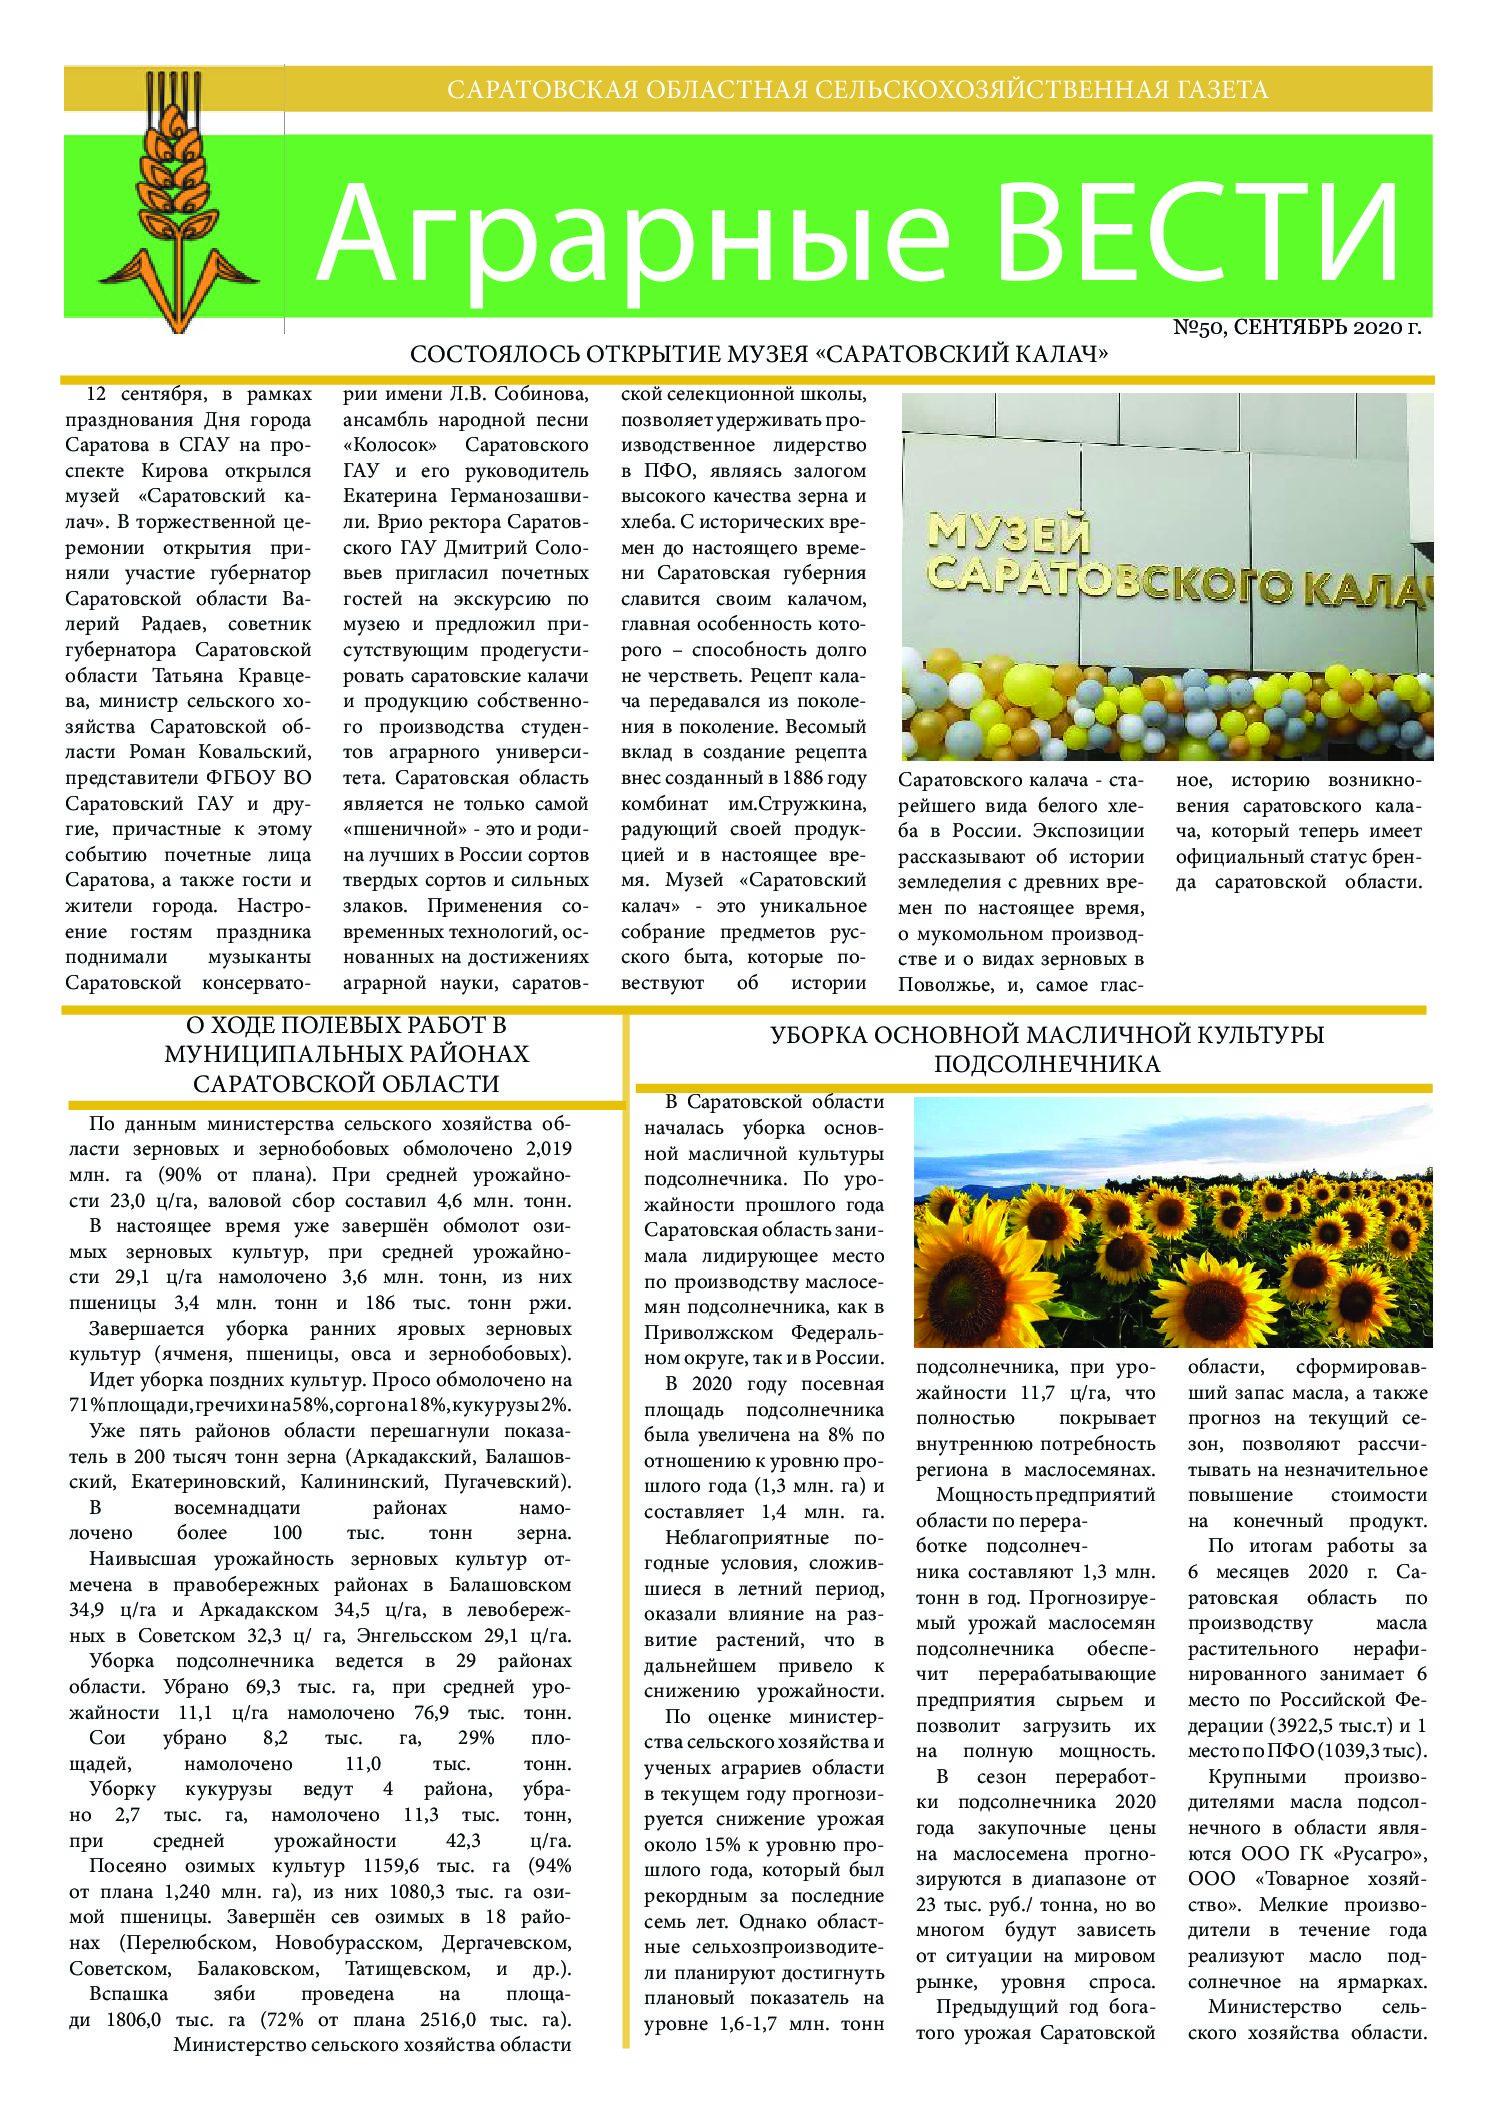 https://saratovagro.ru/wp-content/uploads/2020/10/Сентябрь50-pdf.jpg